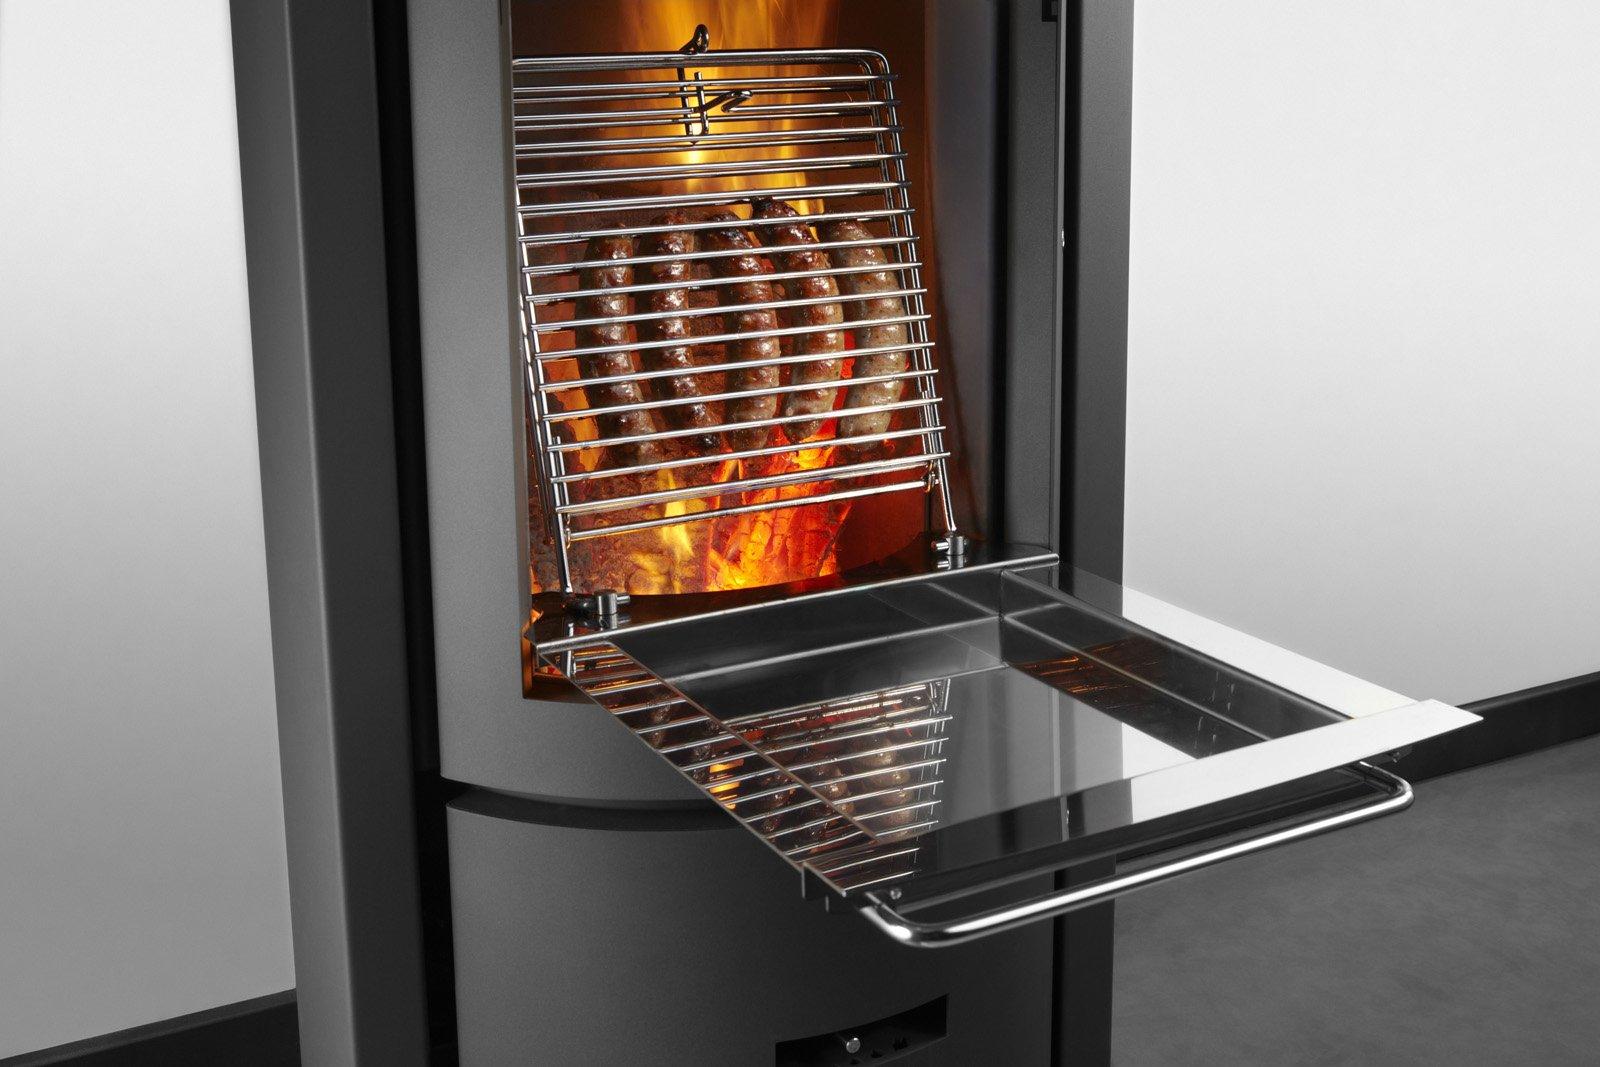 stuv 30 compact h accu barbecue cose di casa. Black Bedroom Furniture Sets. Home Design Ideas